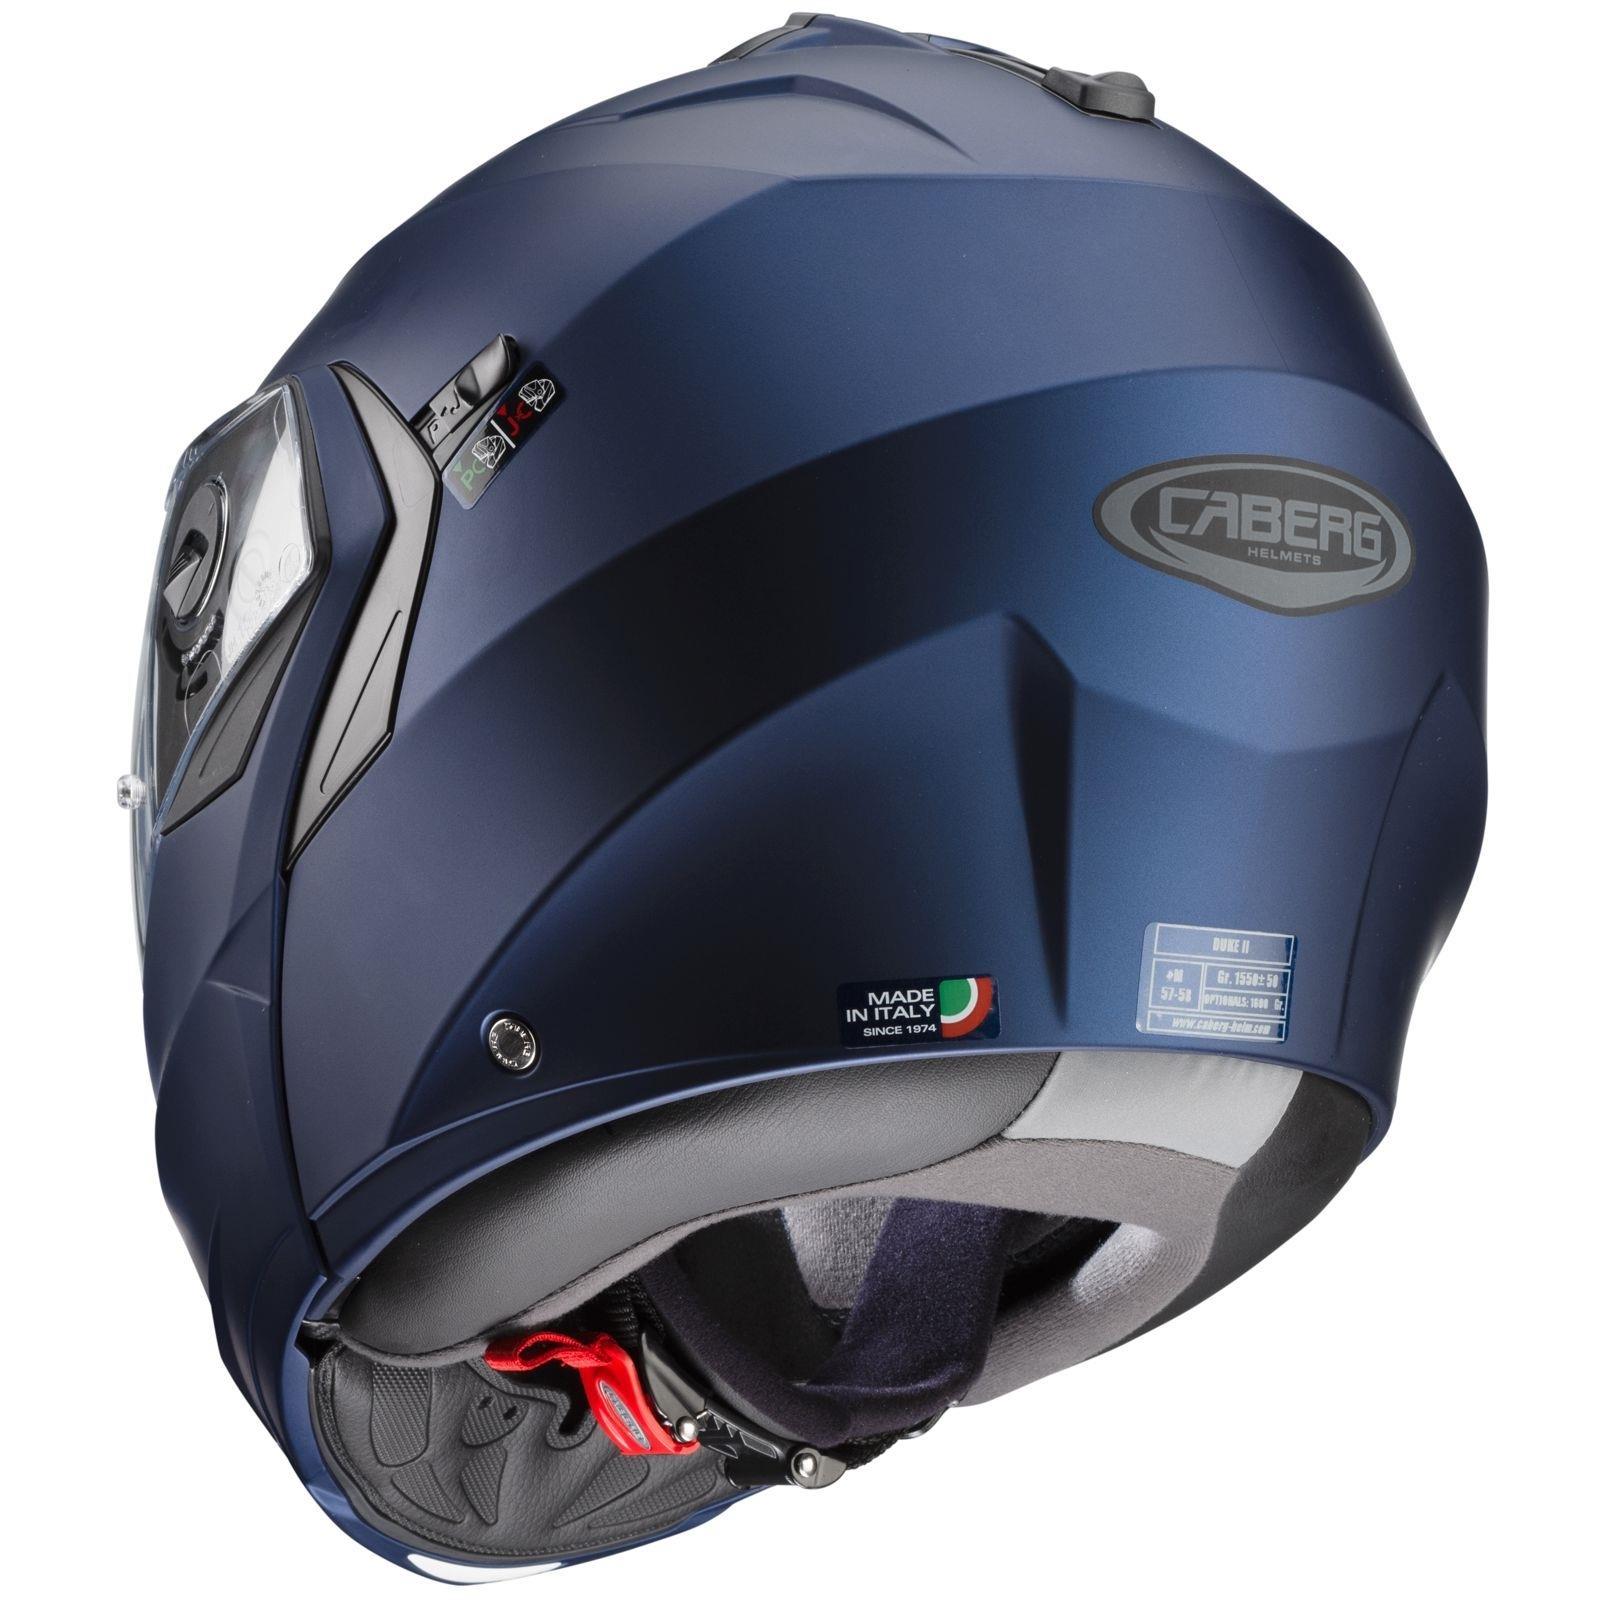 Caberg-Klapp-Helm-Duke-II-2-Motorrad-Belueftet-Sonnenblende-Pinlock-Visier-Jet Indexbild 12